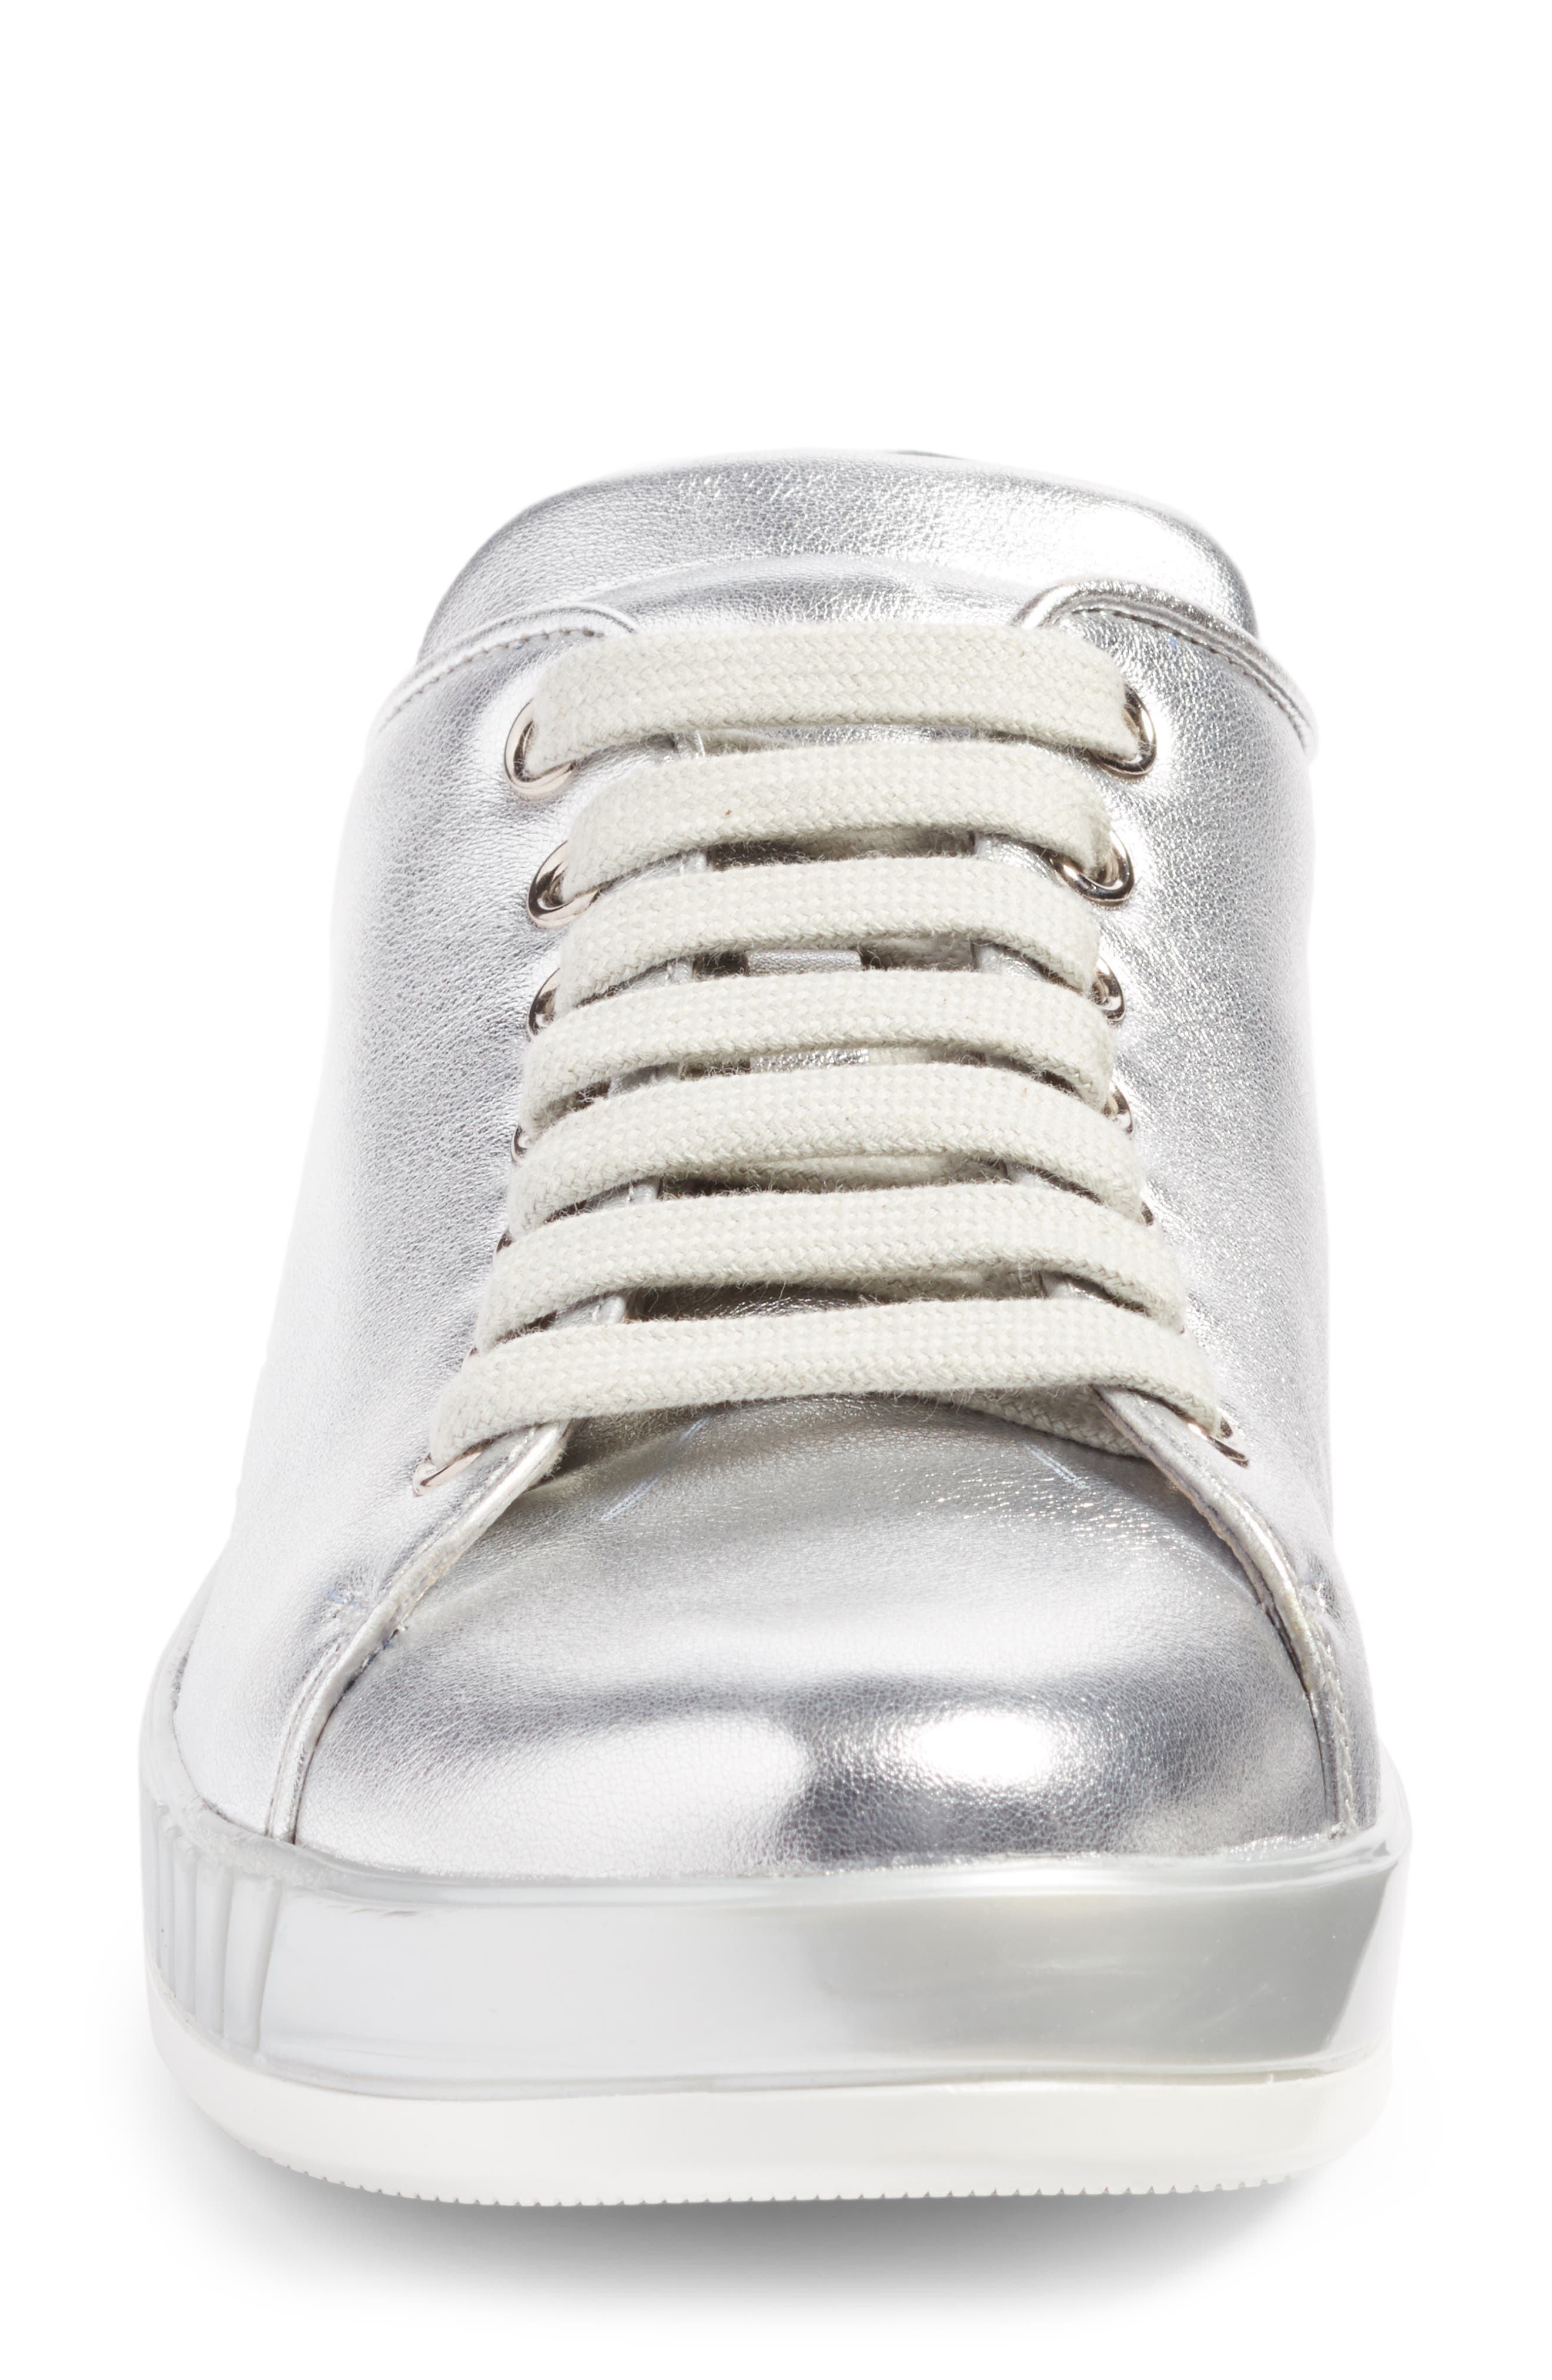 Low Top Sneaker,                             Alternate thumbnail 4, color,                             Metallic Silver